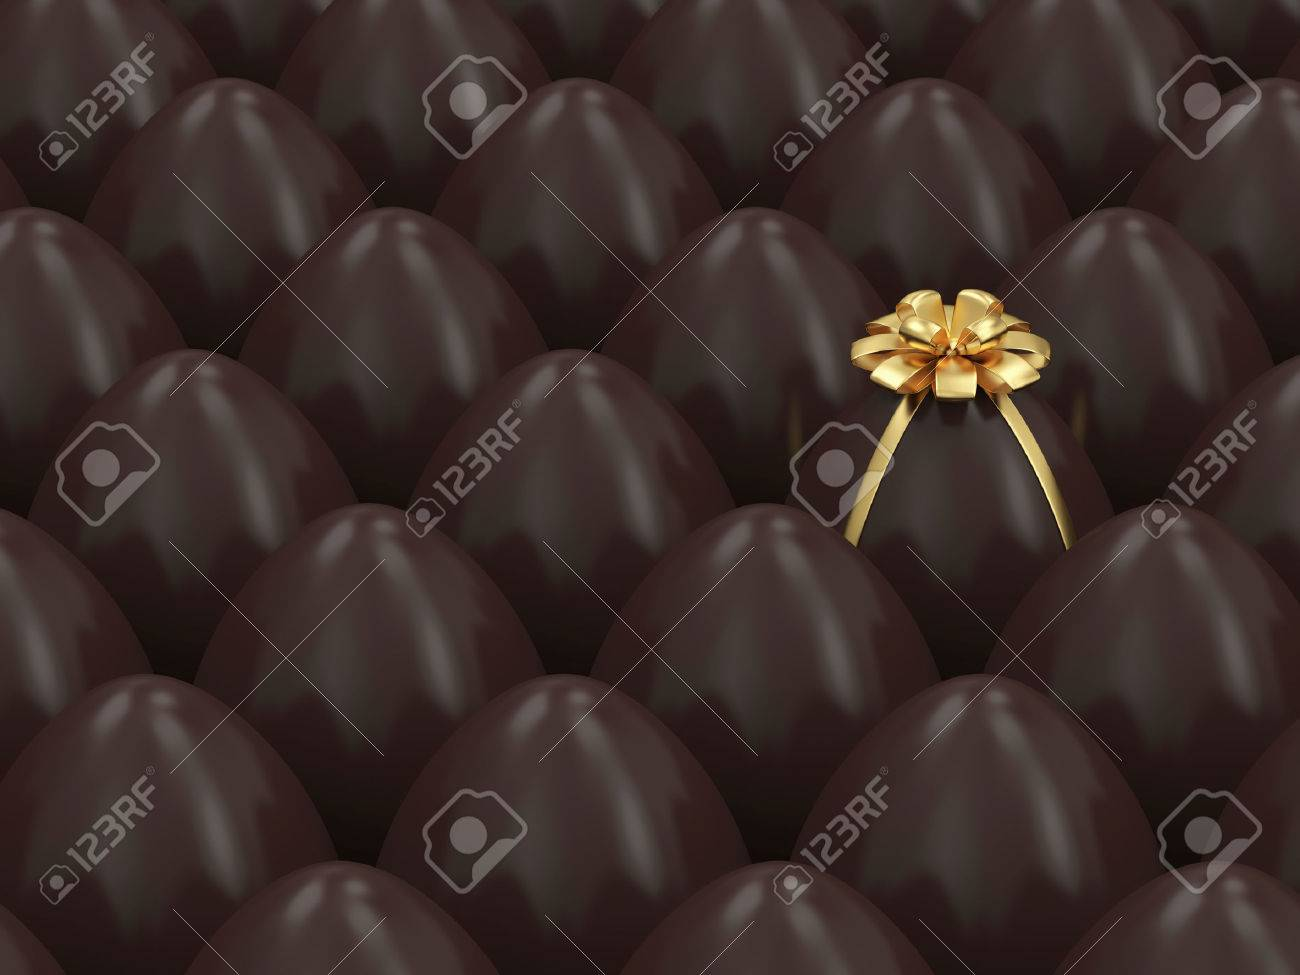 Chocolate Easter Egg Conceptual Image Stock Photo - 25163178